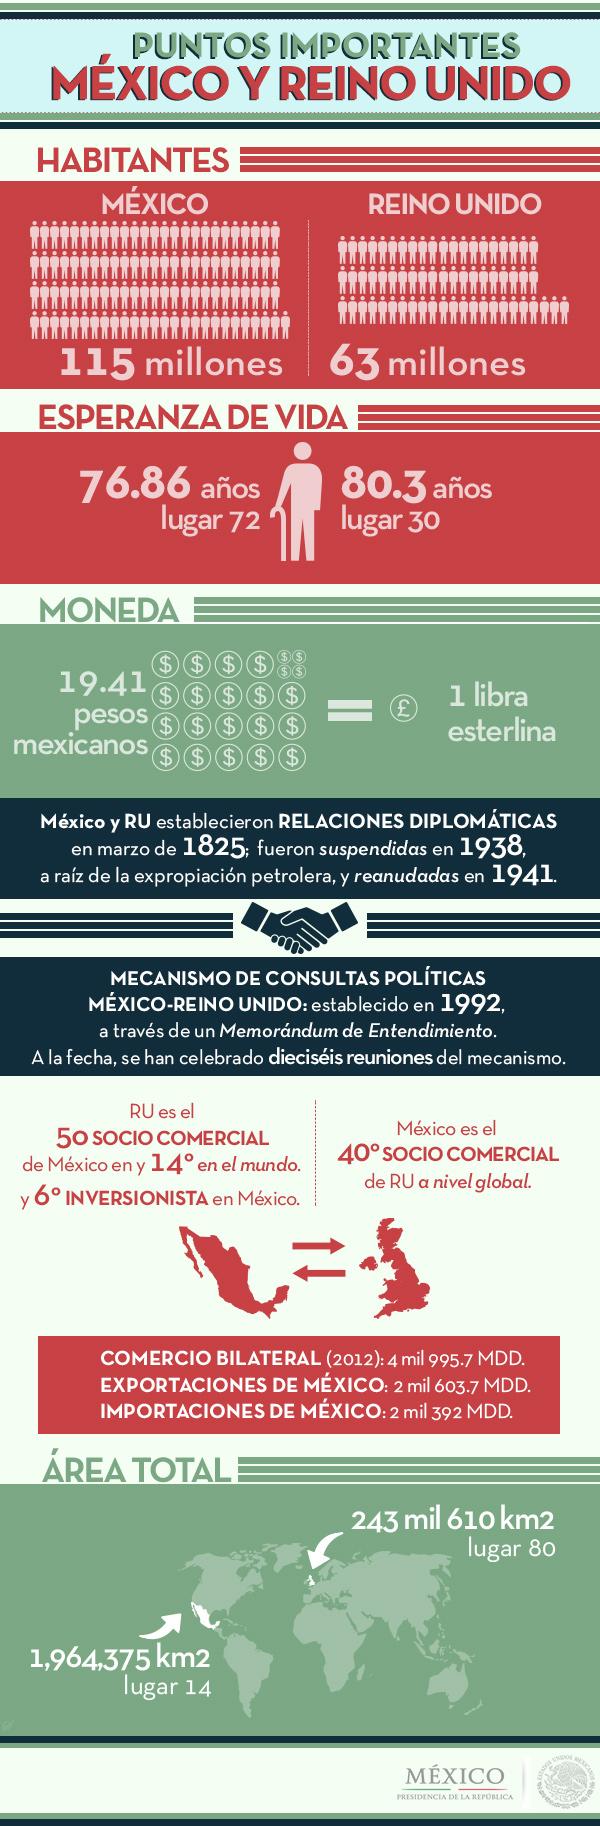 MEXUKINFOGRAFIA.jpg